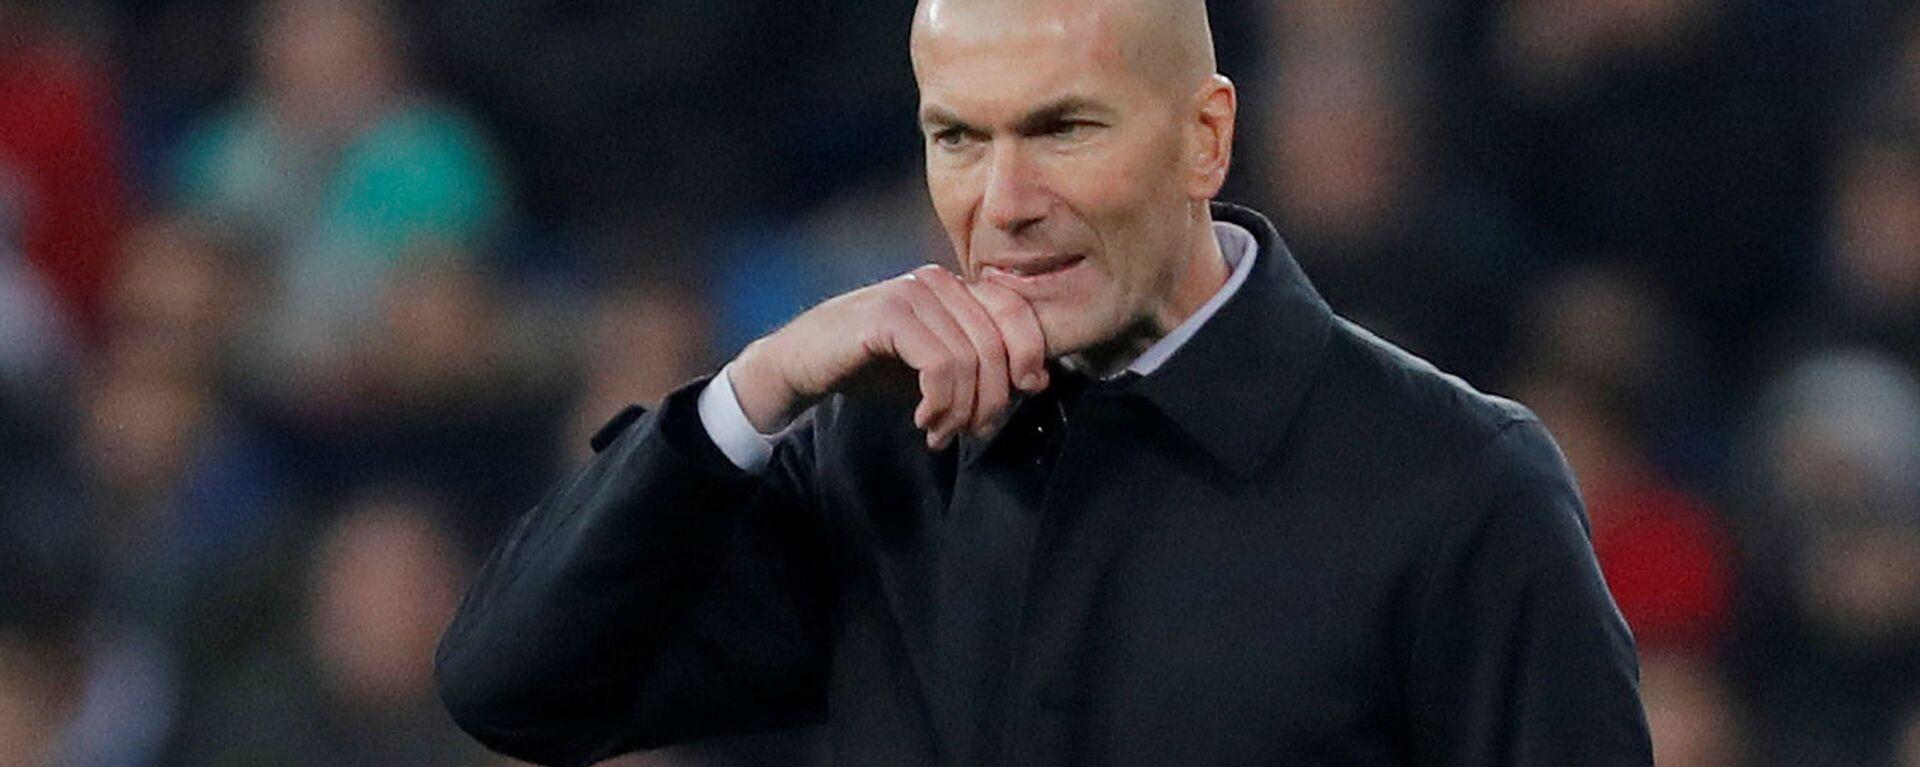 El exentrenador del Real Madrid Zinedine Zidane - Sputnik Mundo, 1920, 31.05.2021